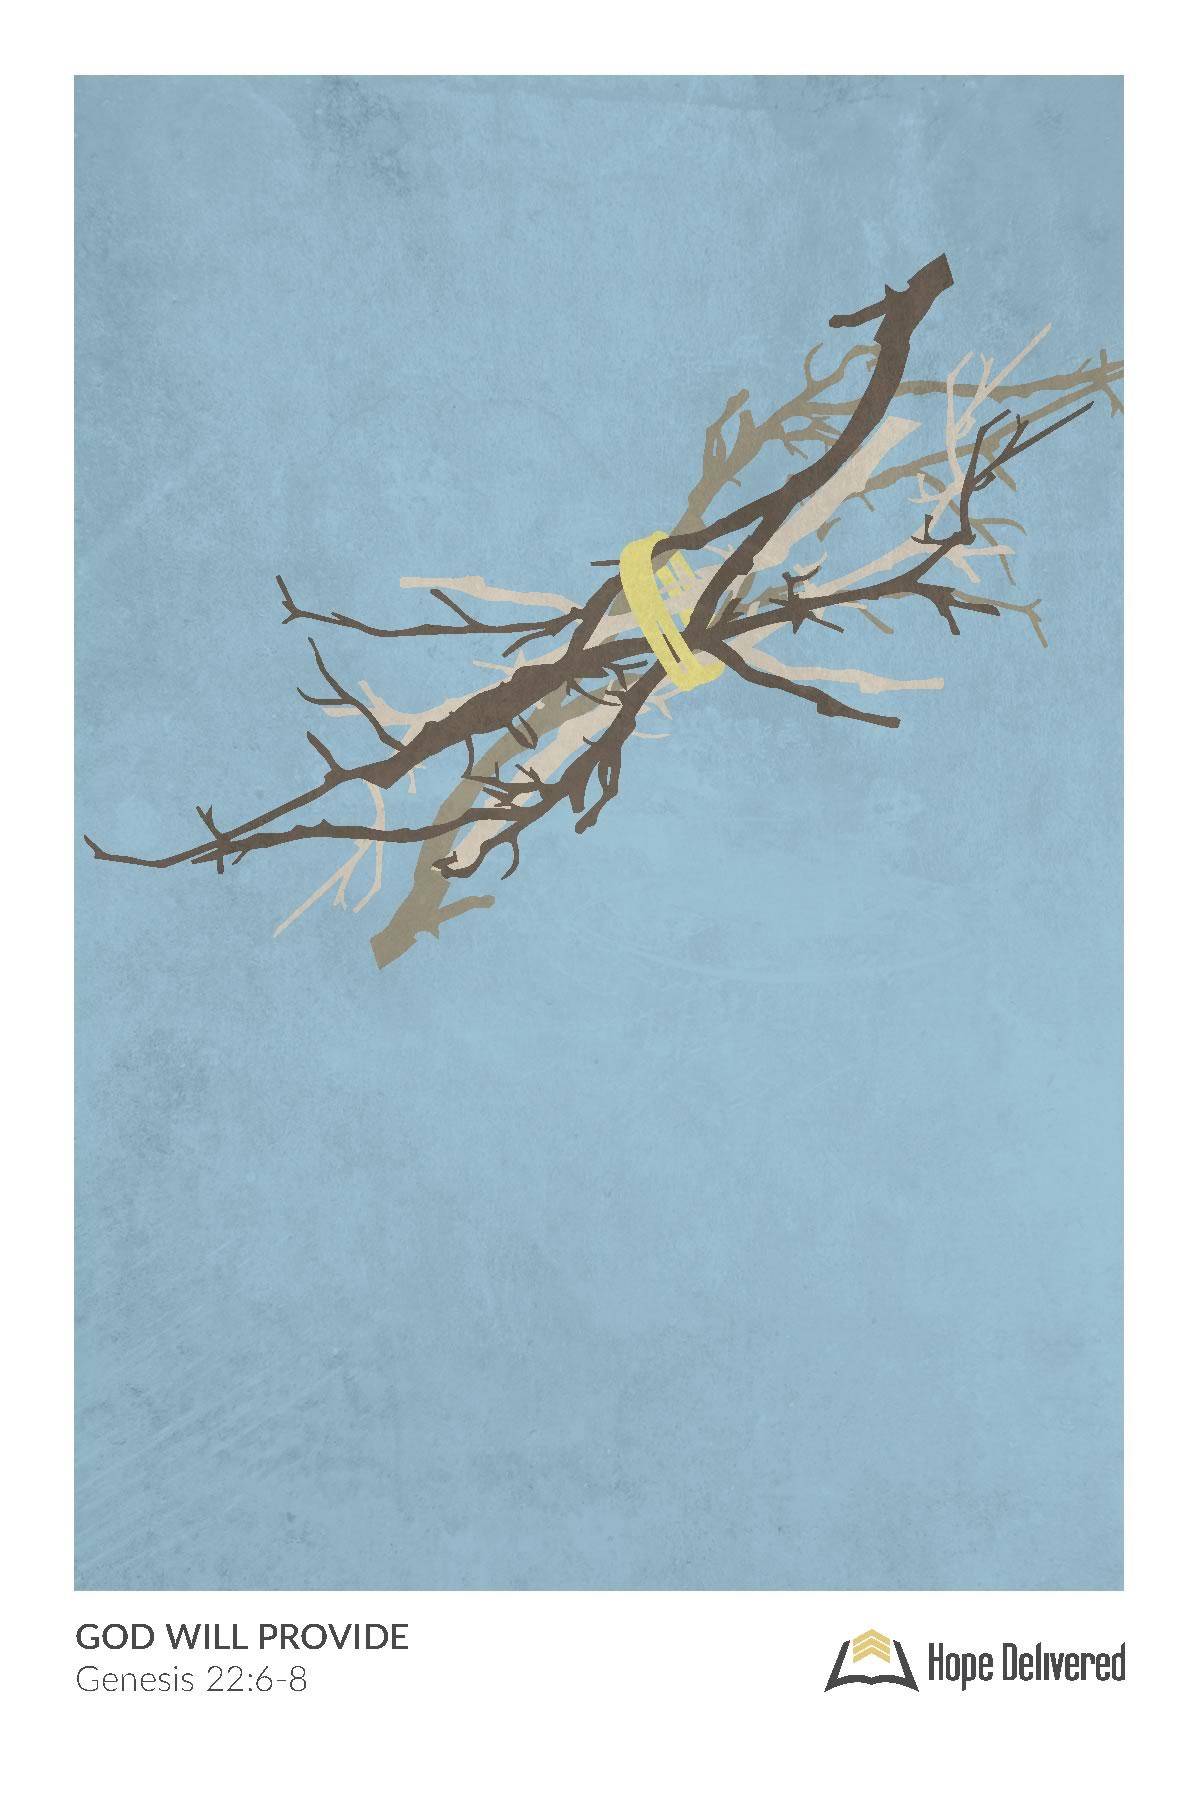 HopeDelivered-ChadLanghoff-ModernBibleArt-ArtPrints-GicleePrint-MinimalistPoster-BibleStory-MinimalistArt-Genesis-FullSeries-MiniPrint-Abraham-0009-photo.jpg